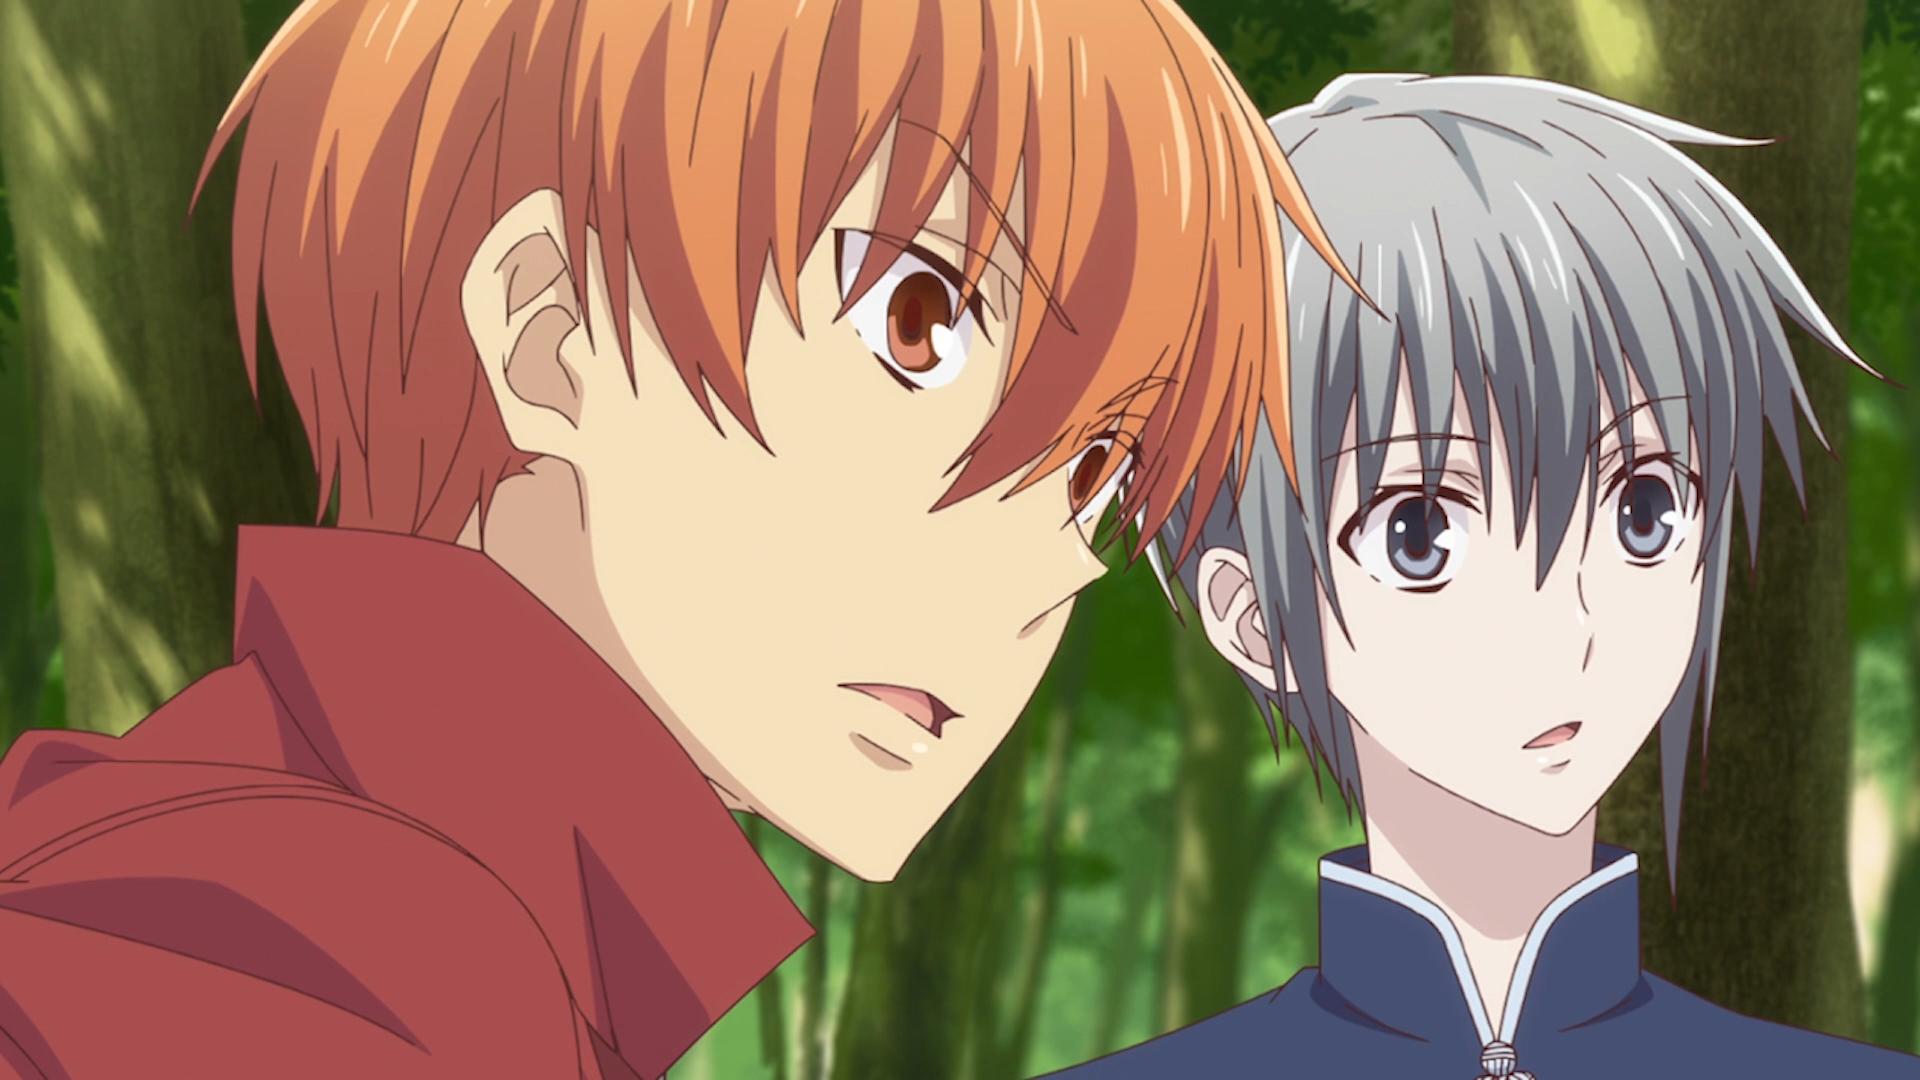 Pin on anime • fruits basket